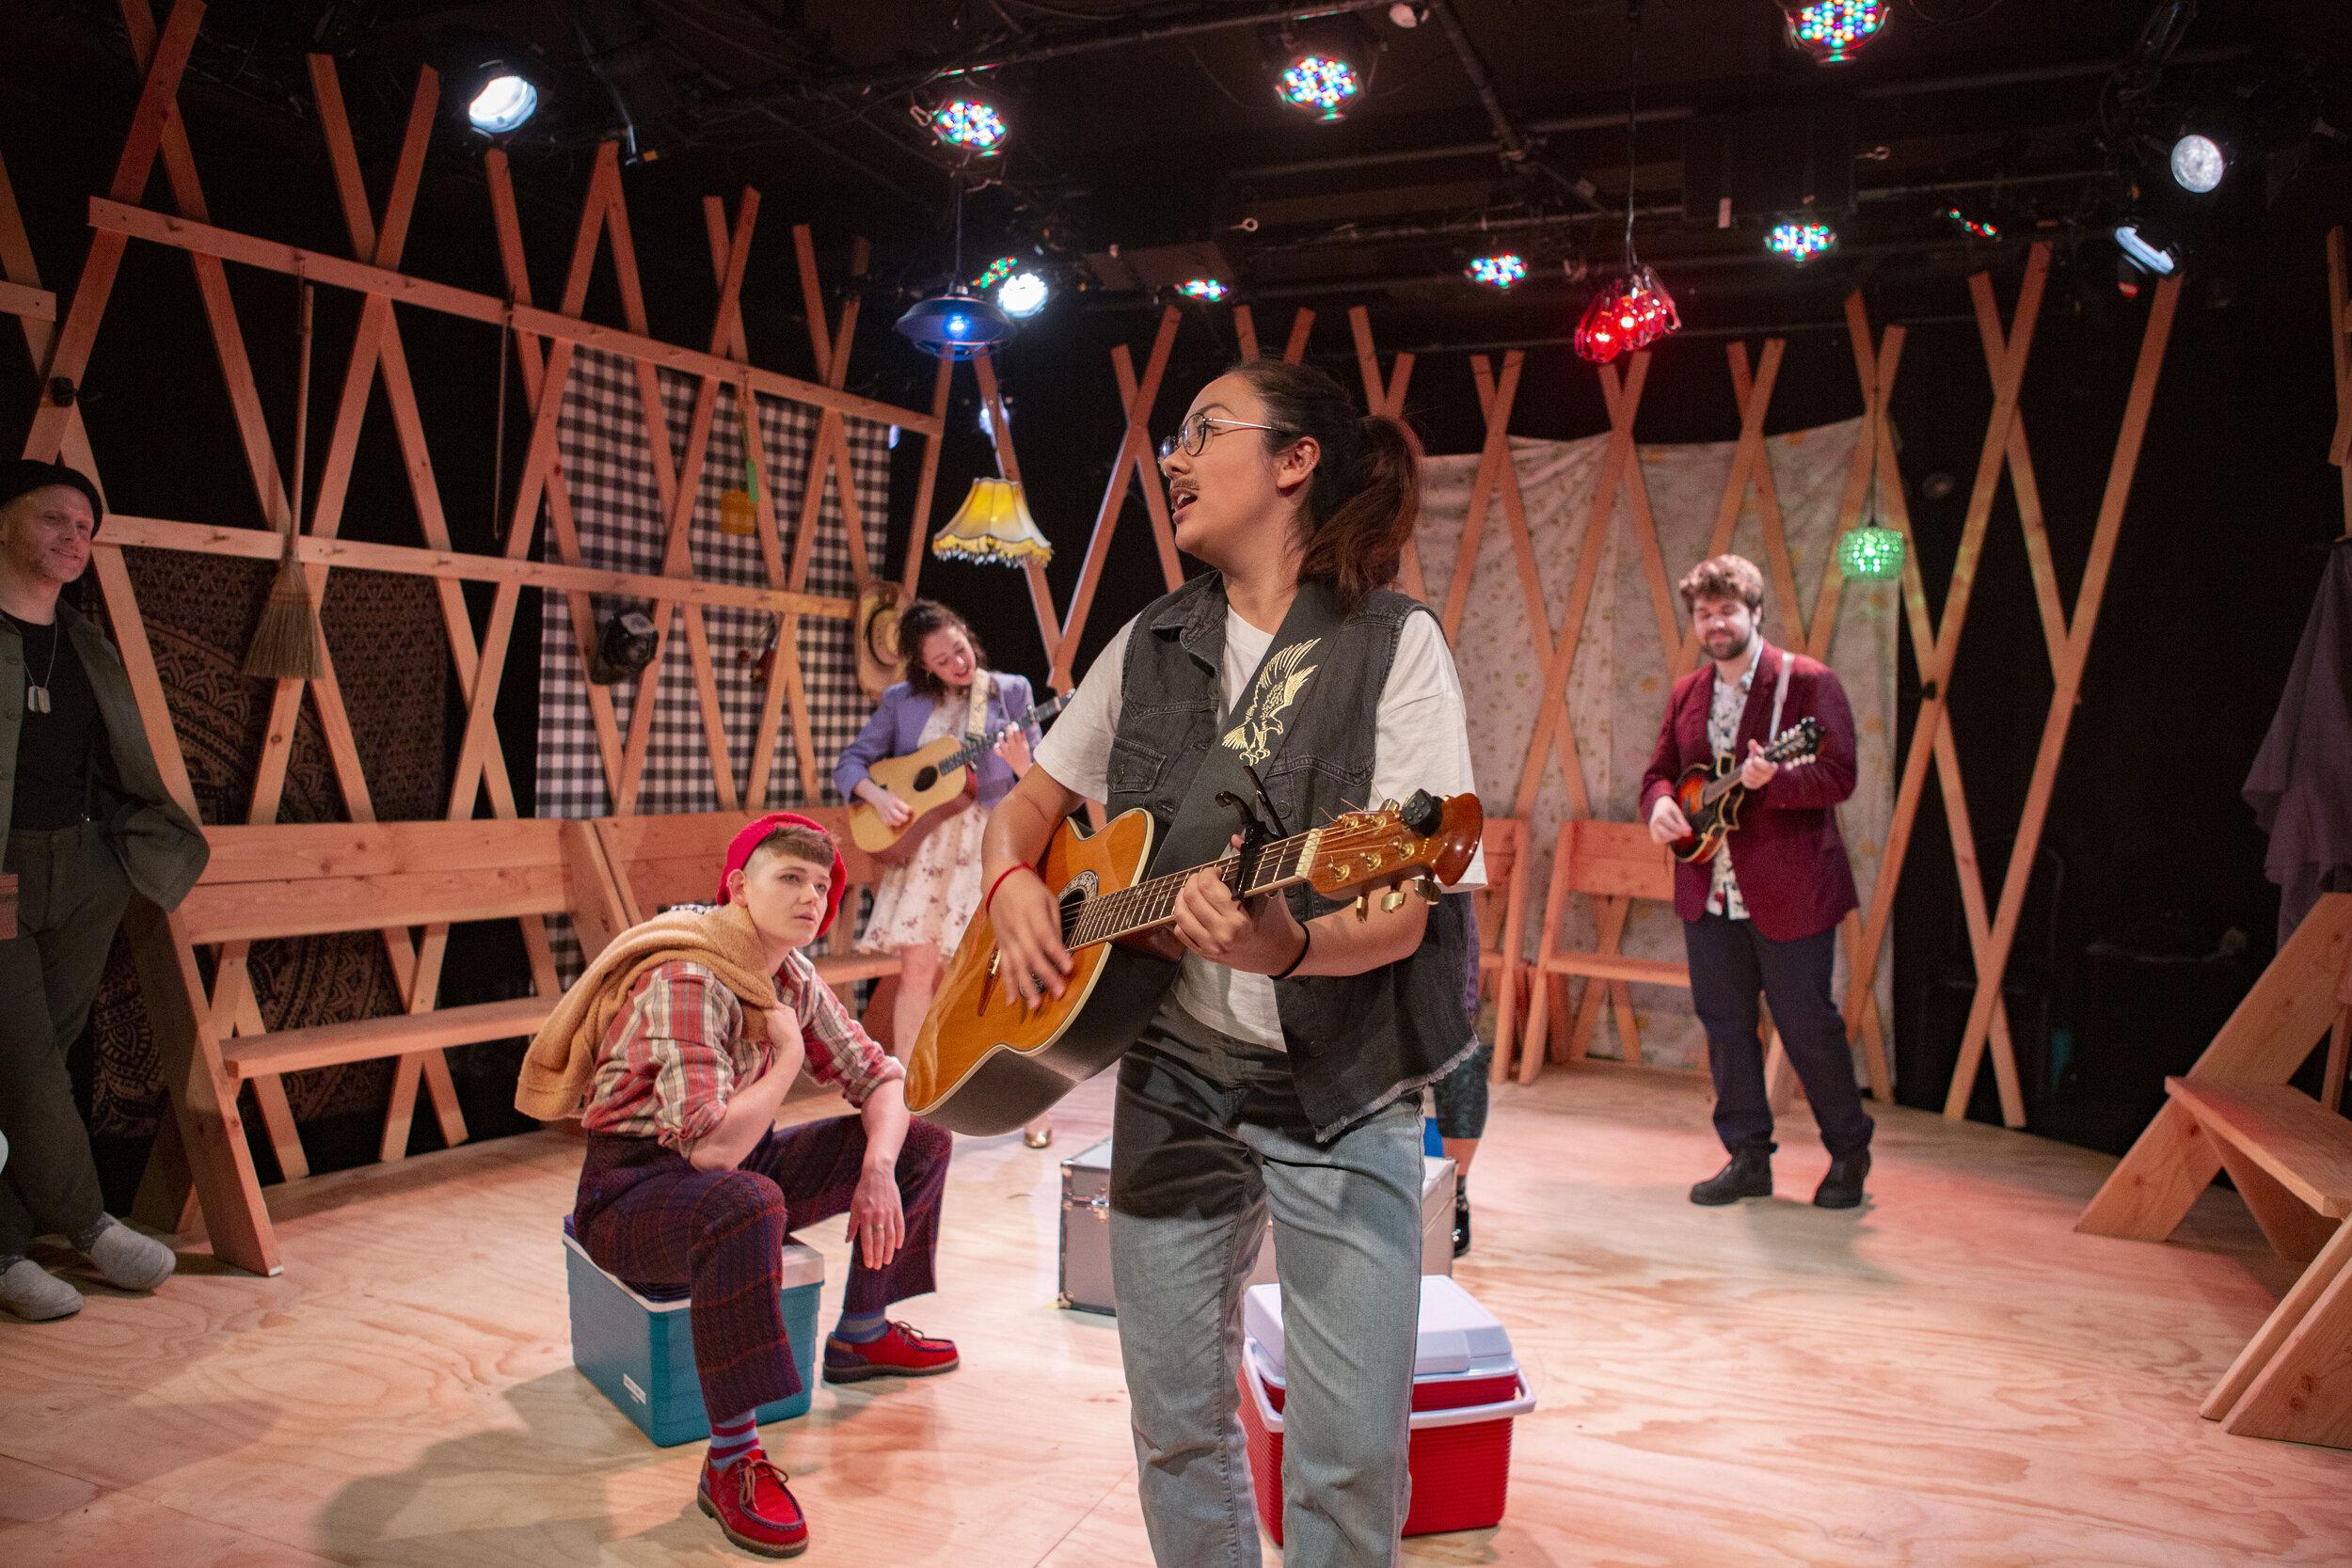 Hootenanny: Twelfth Night